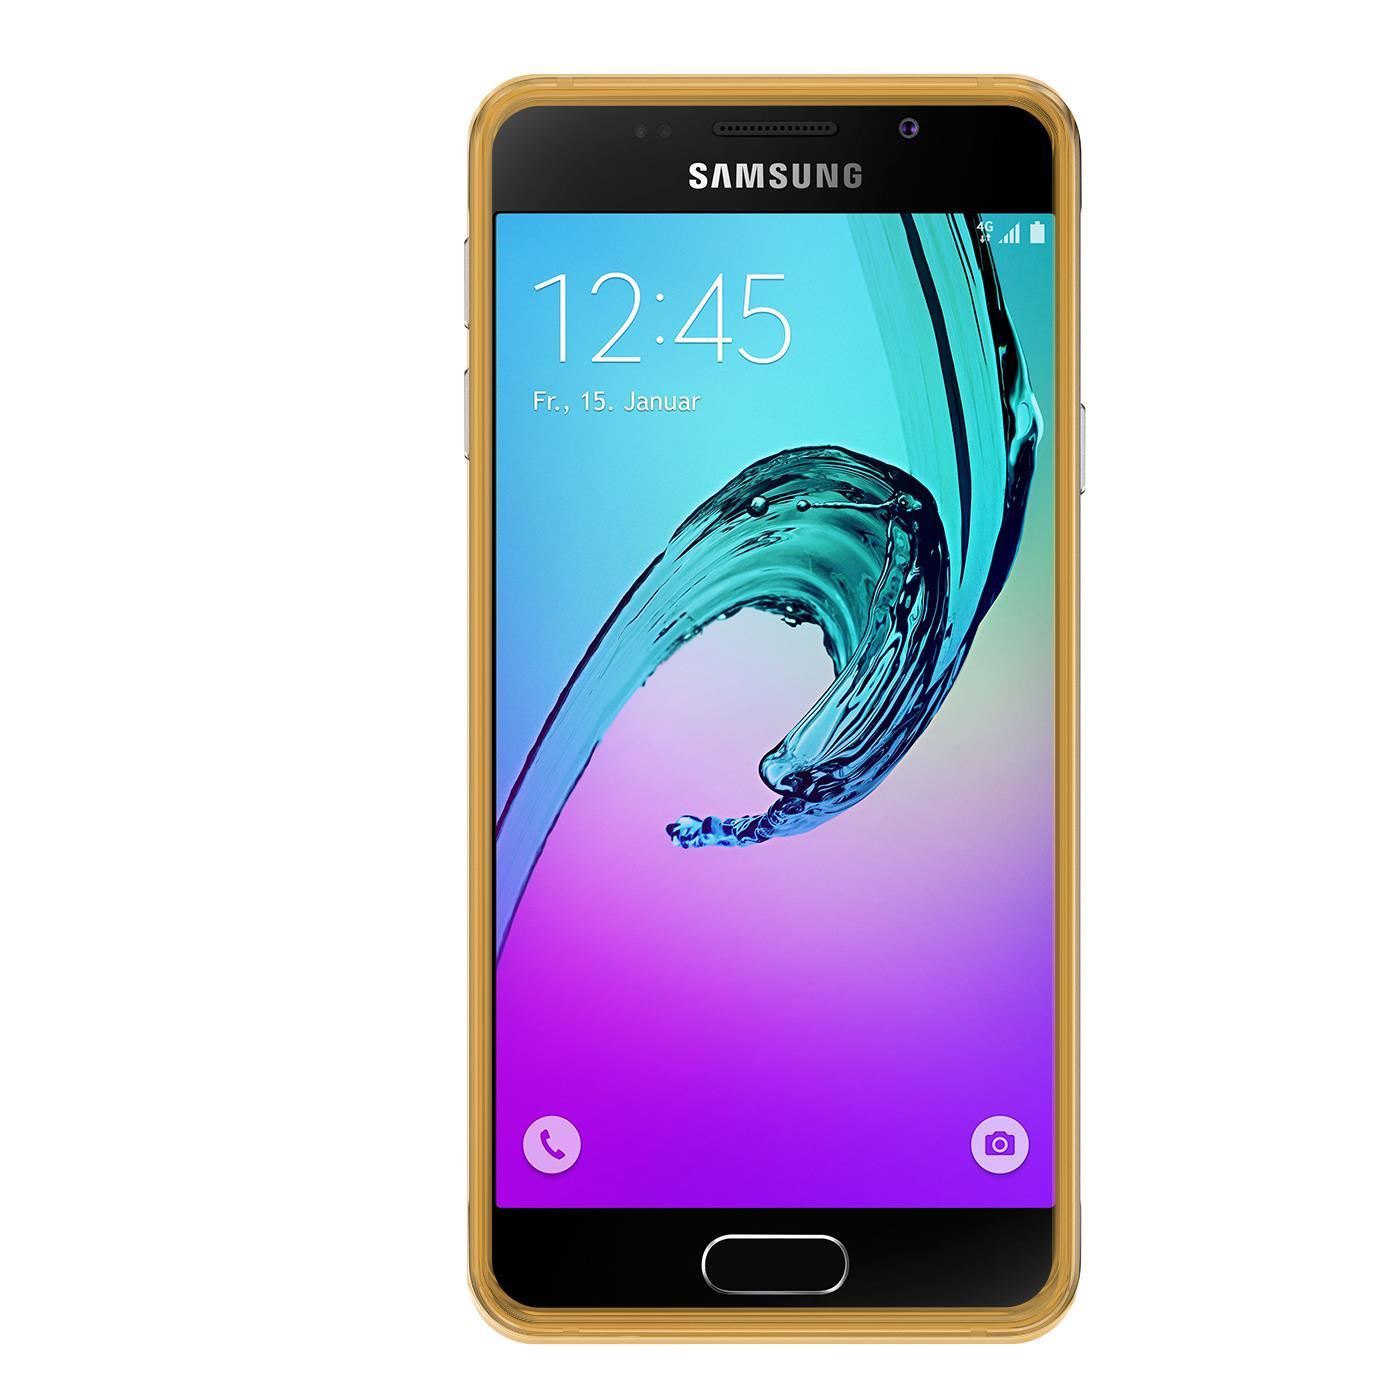 Samsung-Galaxy-a3-2016-Thin-Silikon-Klar-Case-Cover-Ultra-Slim-Stossfeste-Gel Indexbild 17